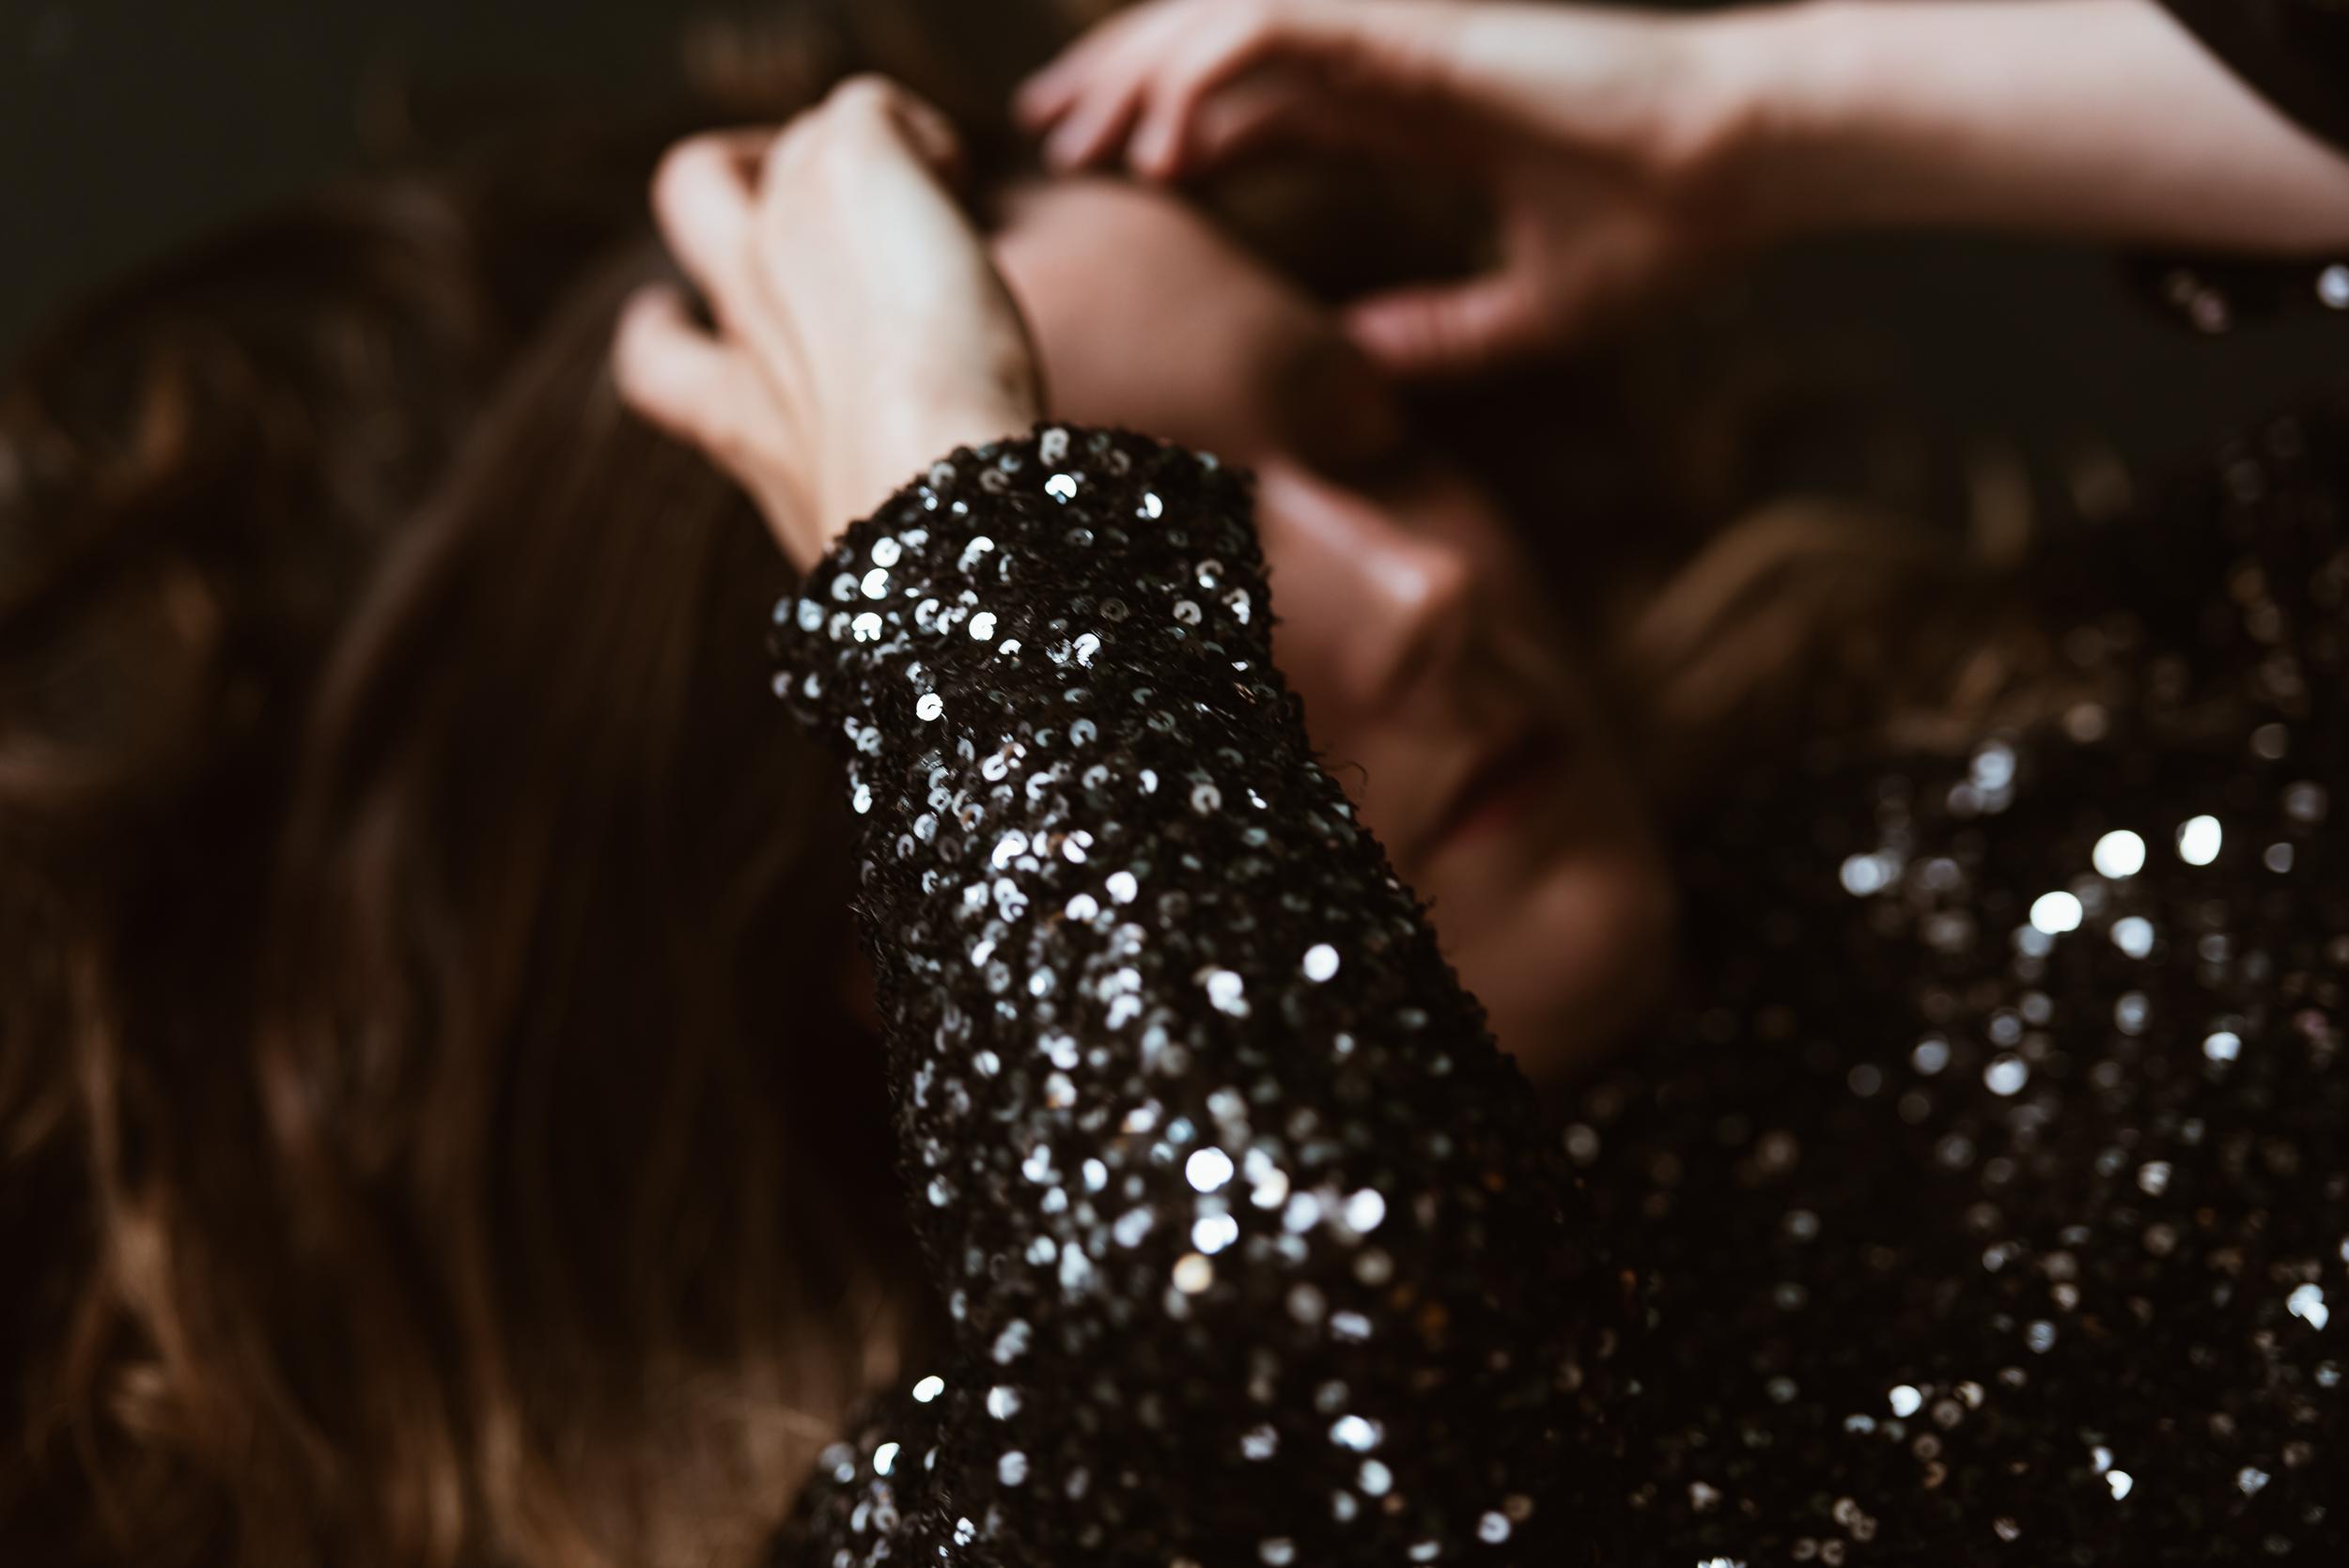 20190907-AmandaLewis-PortraitsCassRudolph-SocialMediaSize-11.jpg